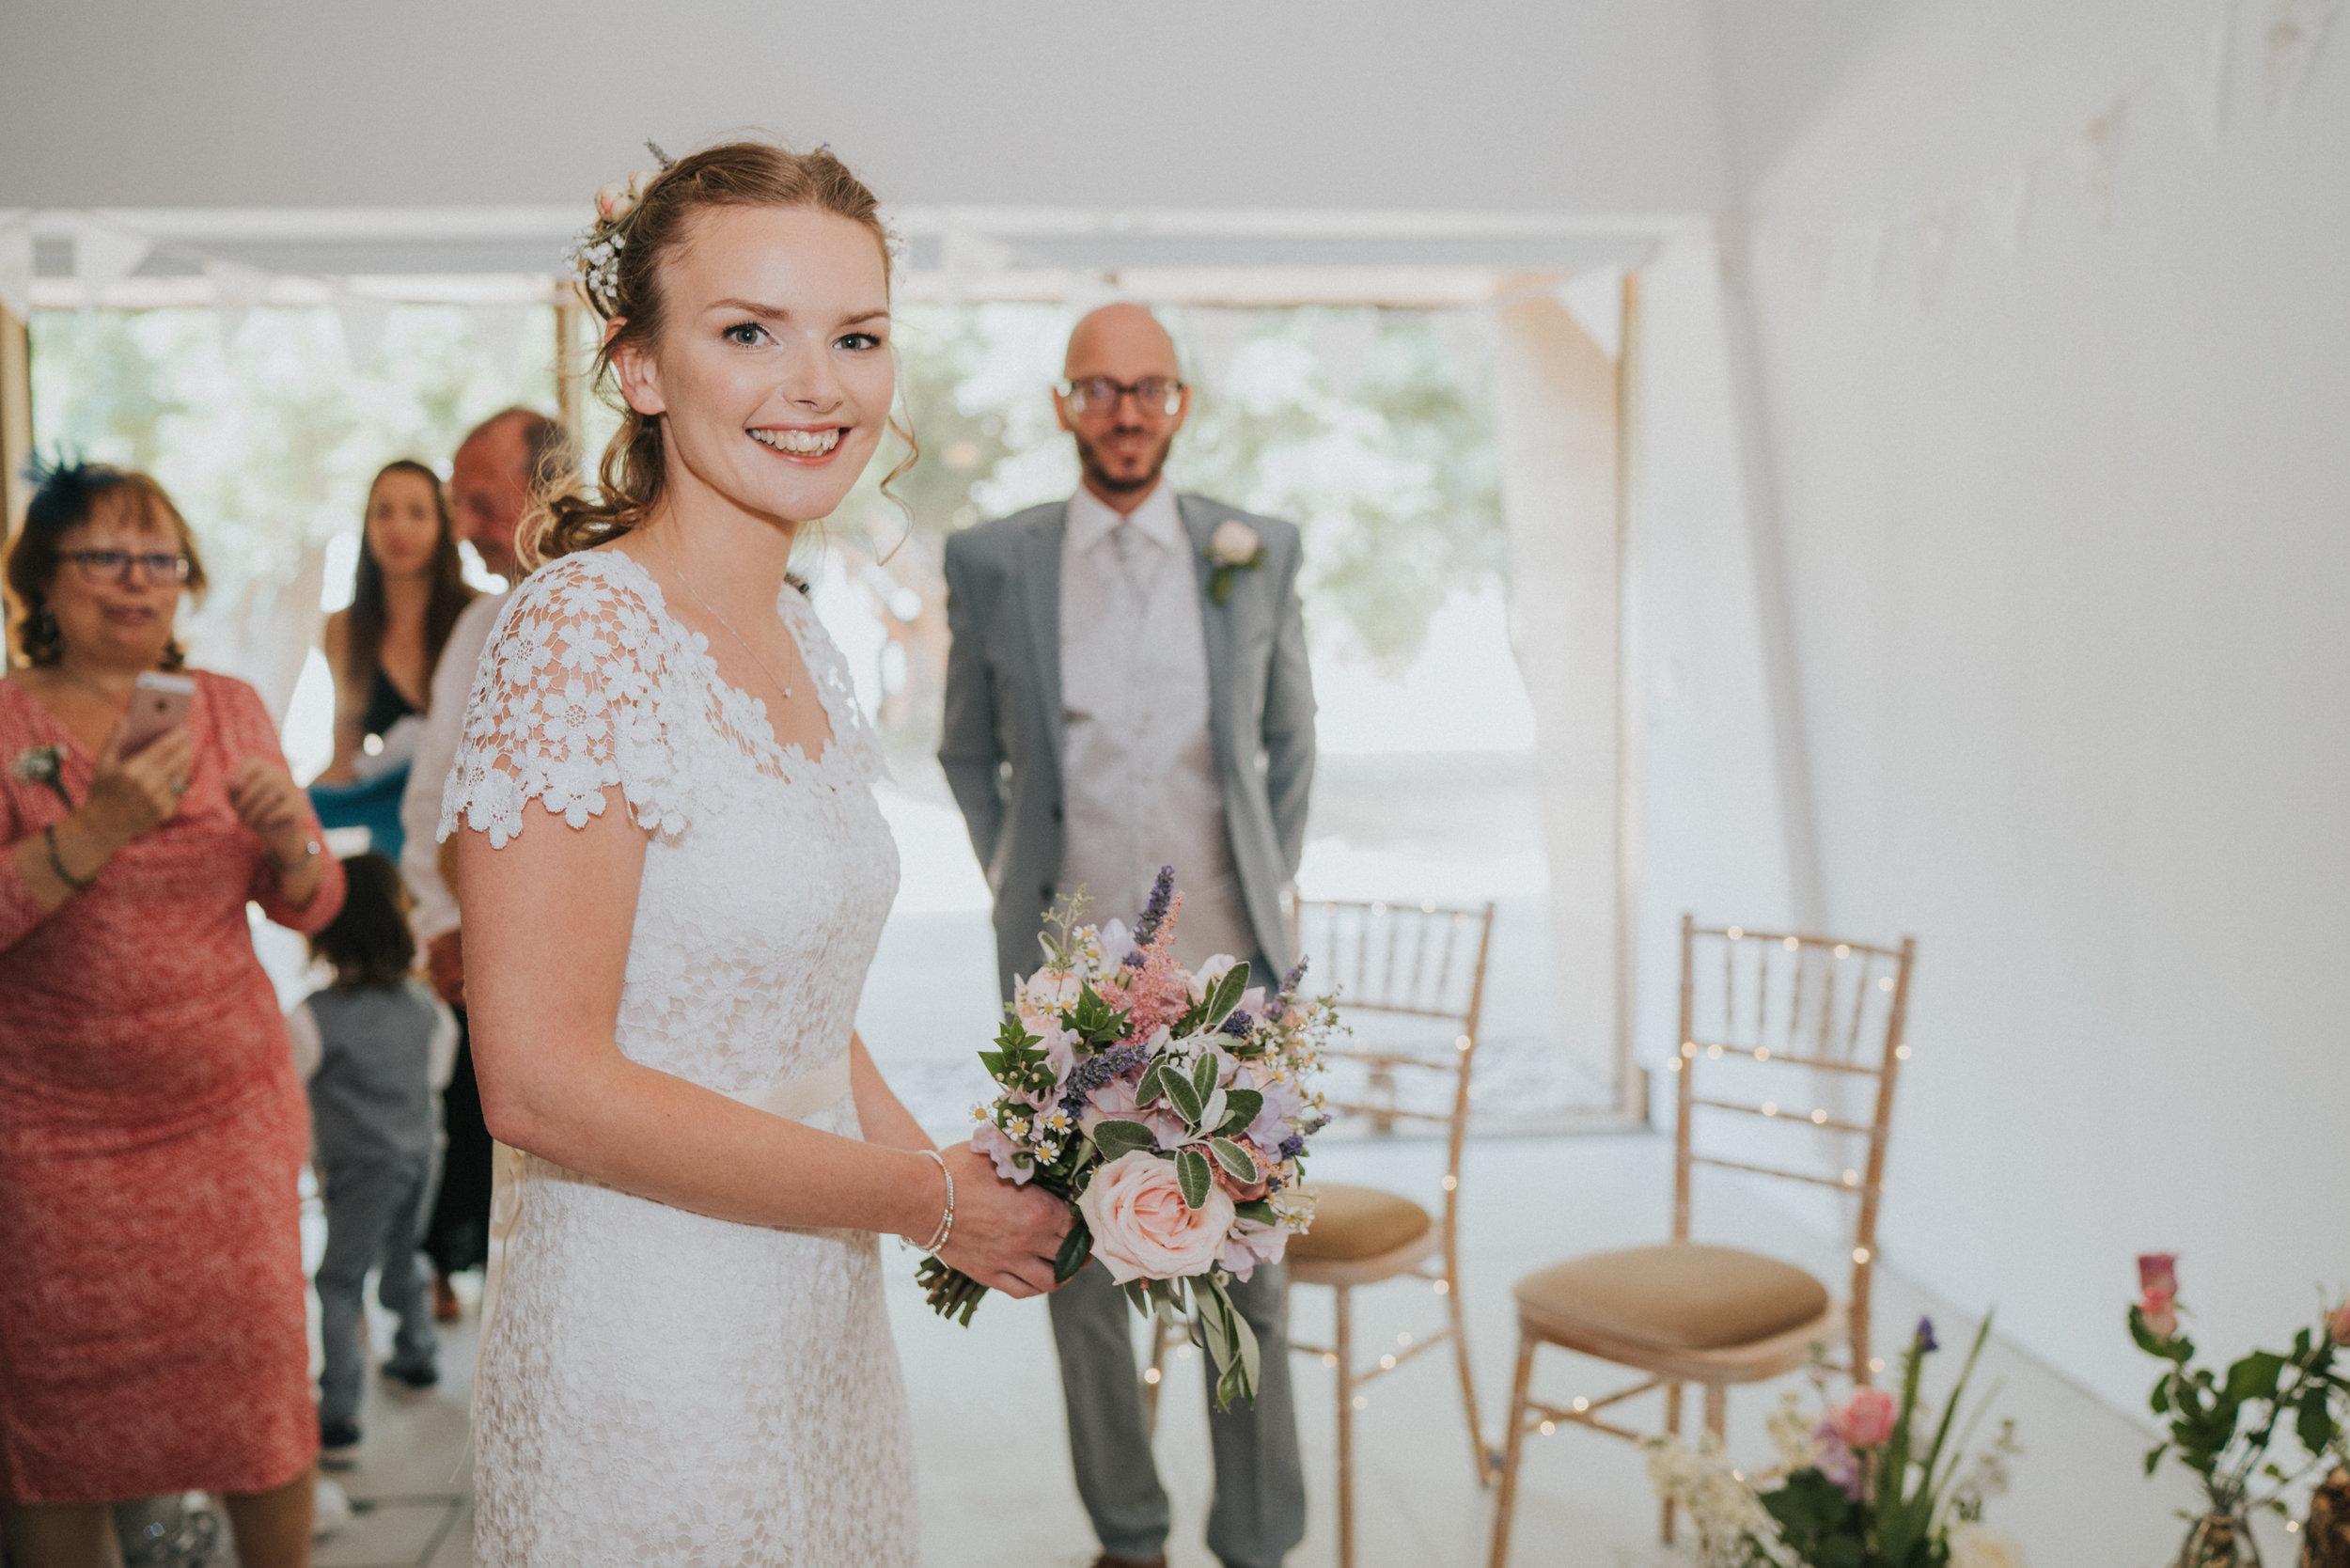 Grace-Elizabeth-Georgie-Amalaketu-Firstsite-Colchester-Essex-Boho-Buddhist-Wedding-Alternative-Wedding-Photography-Essex (41 of 100).jpg